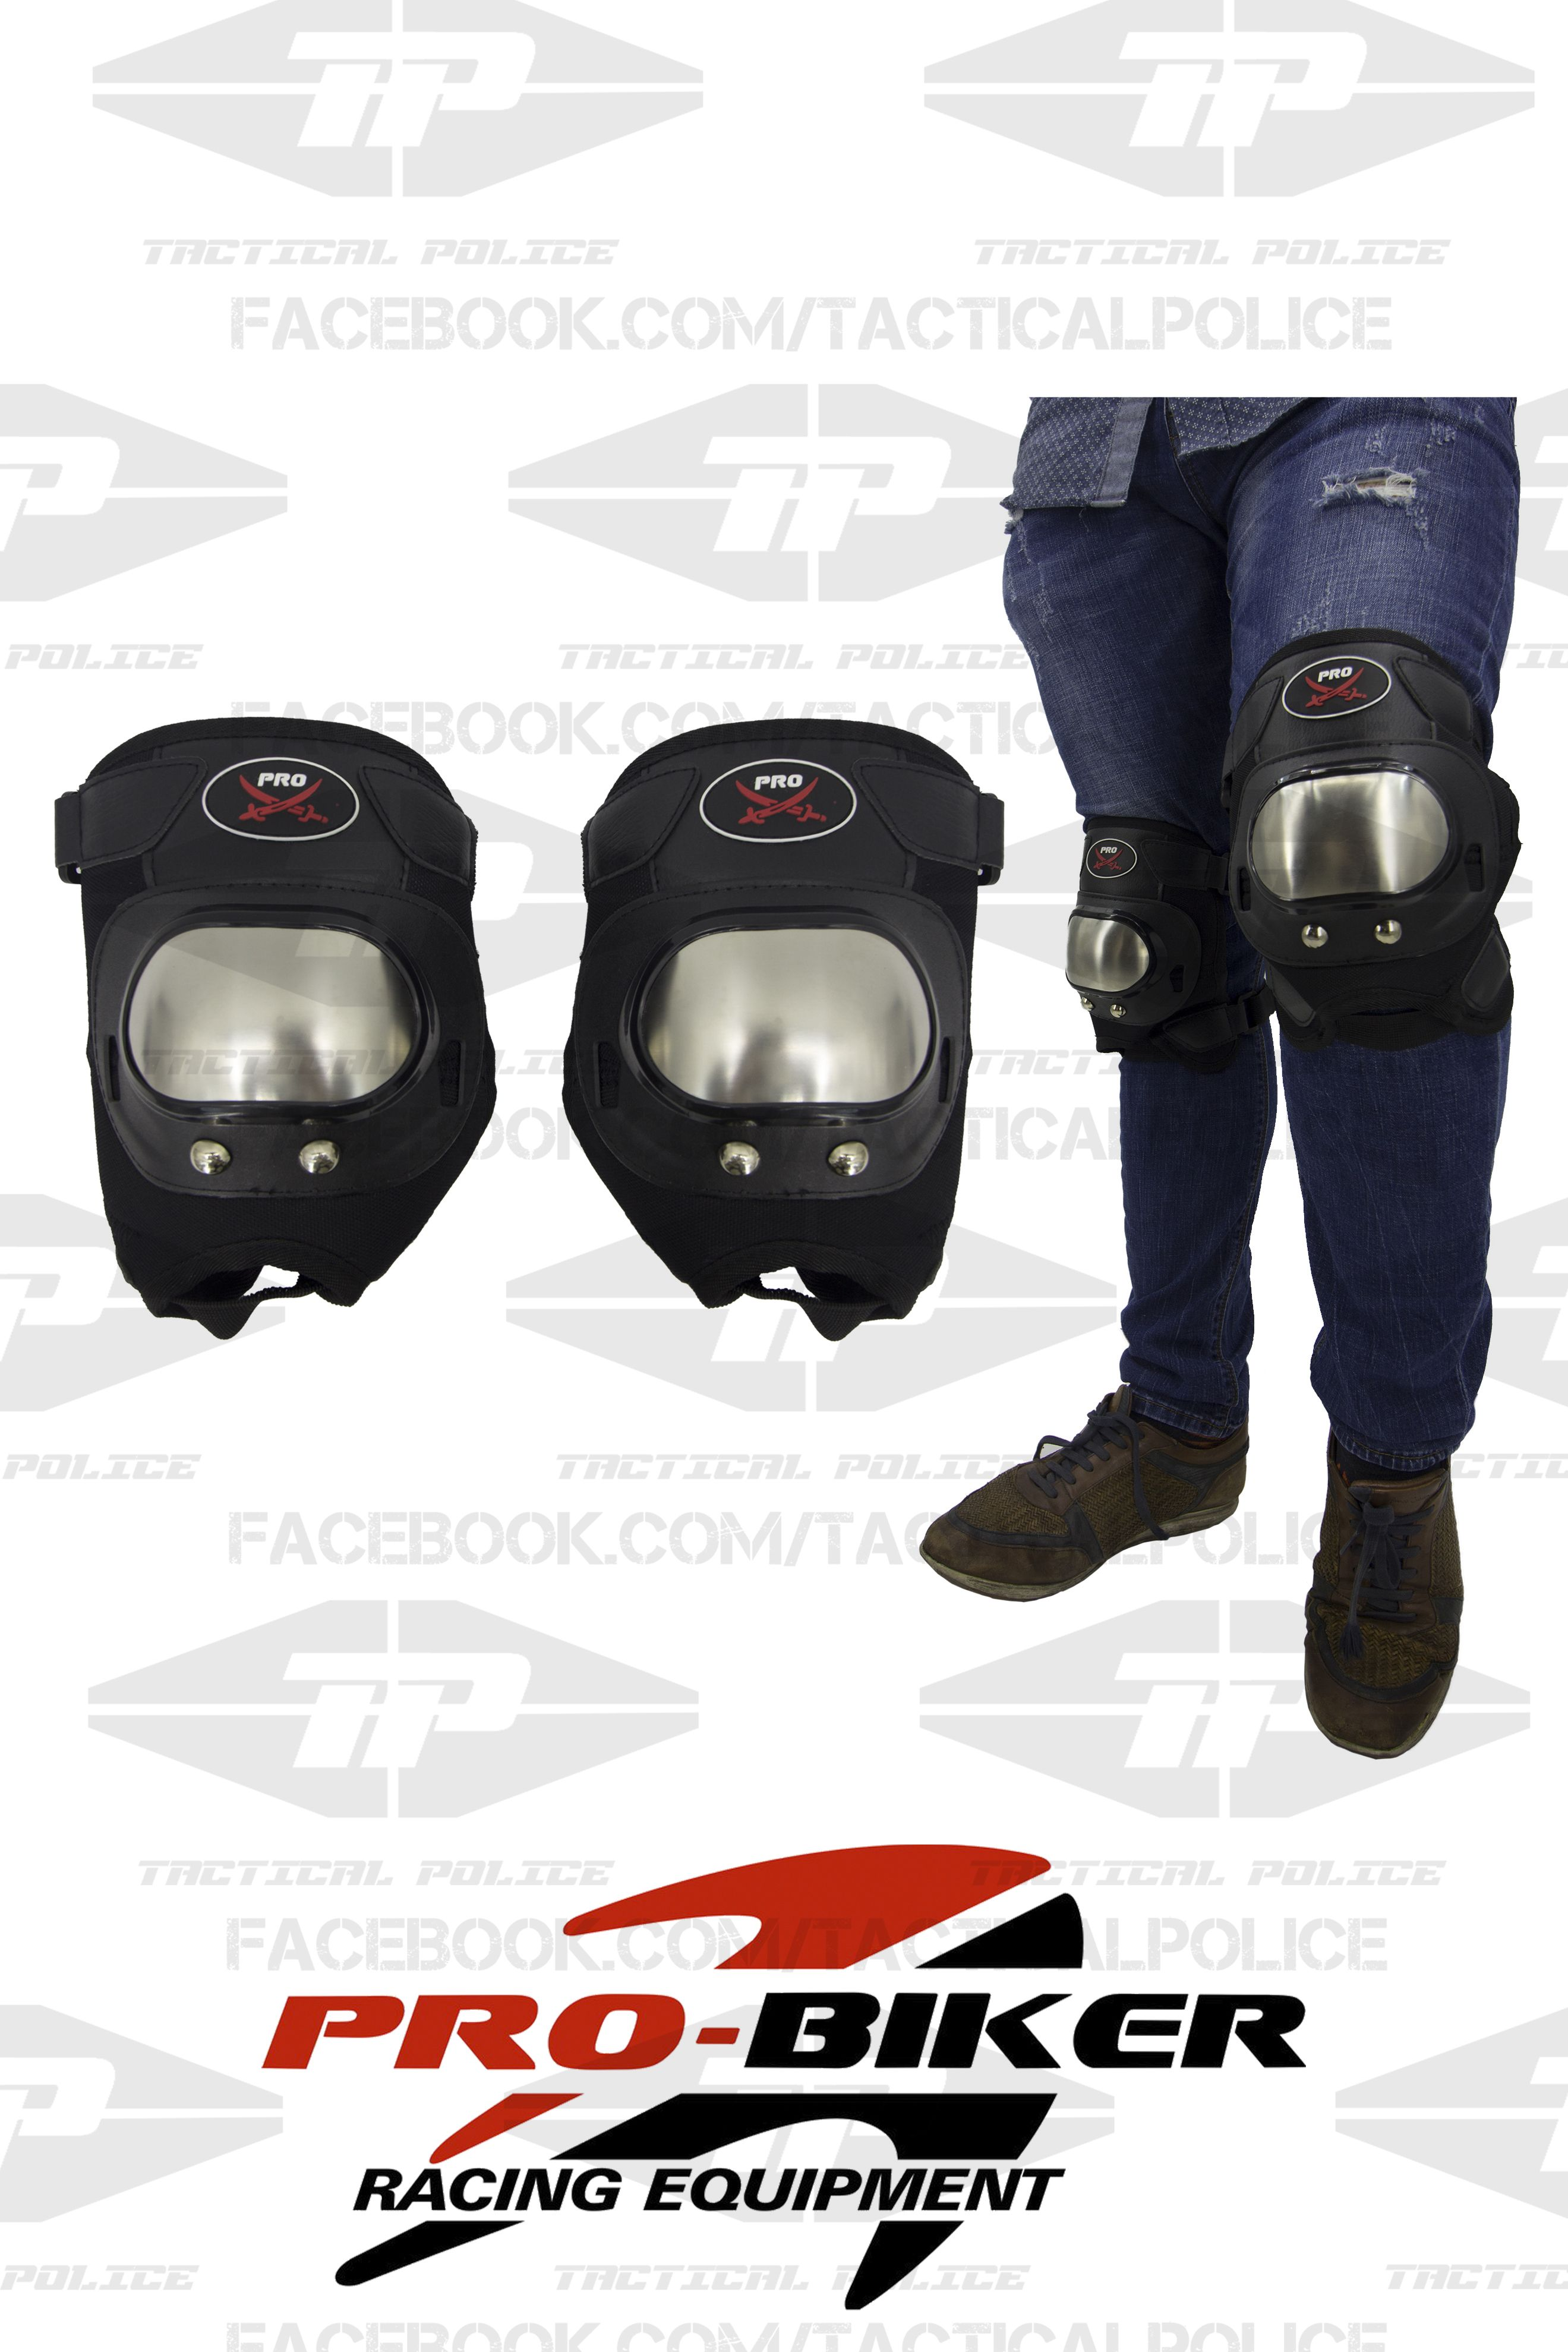 211c69748fb Producto 100% ORIGINAL de PRO BIKER® Marca  PRO BIKER® Modelo   R-Proteccion-6